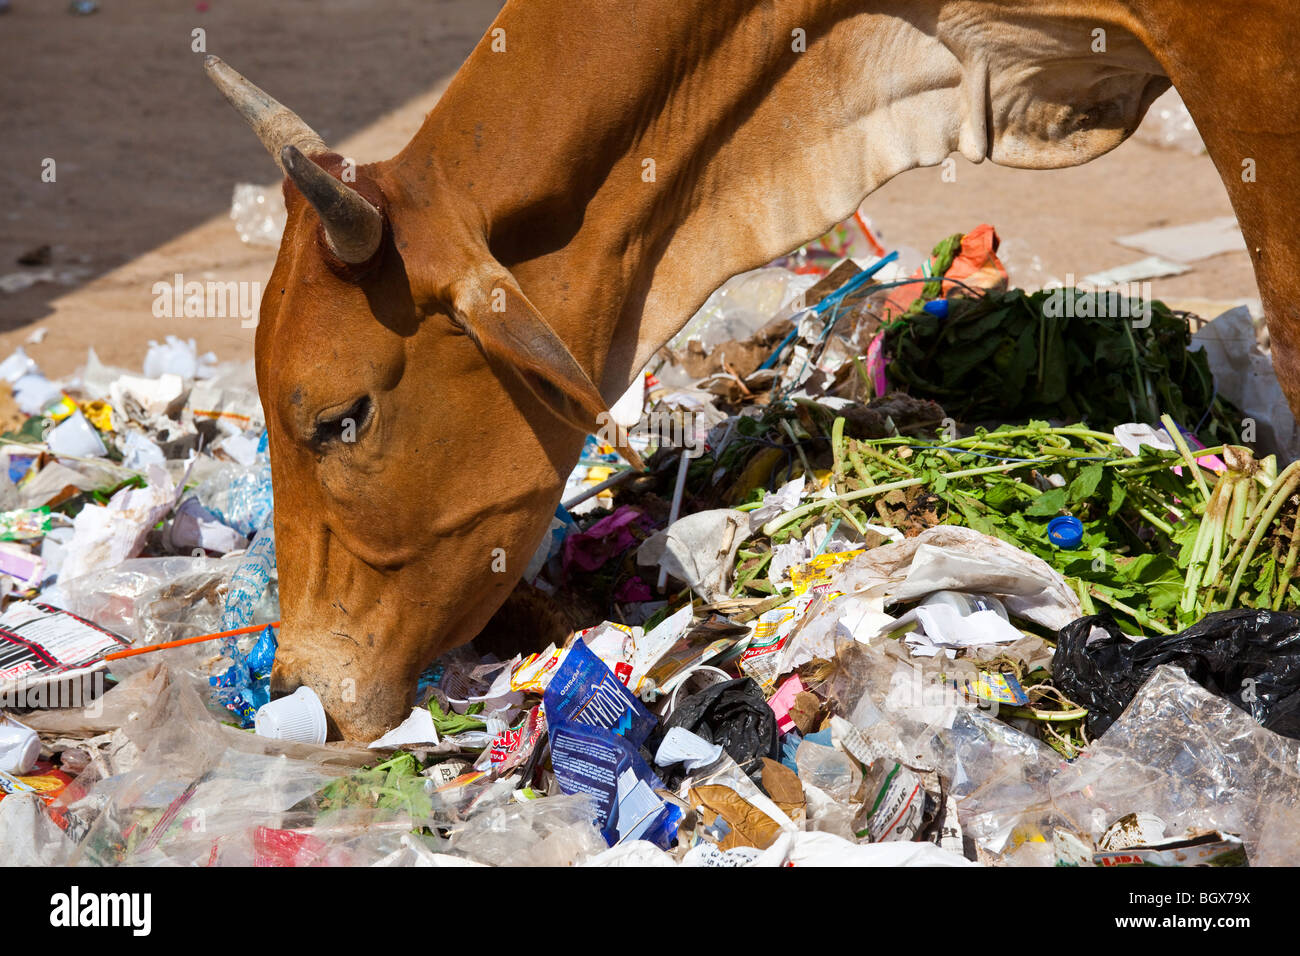 Cow eating garbage in Pushkar, India - Stock Image